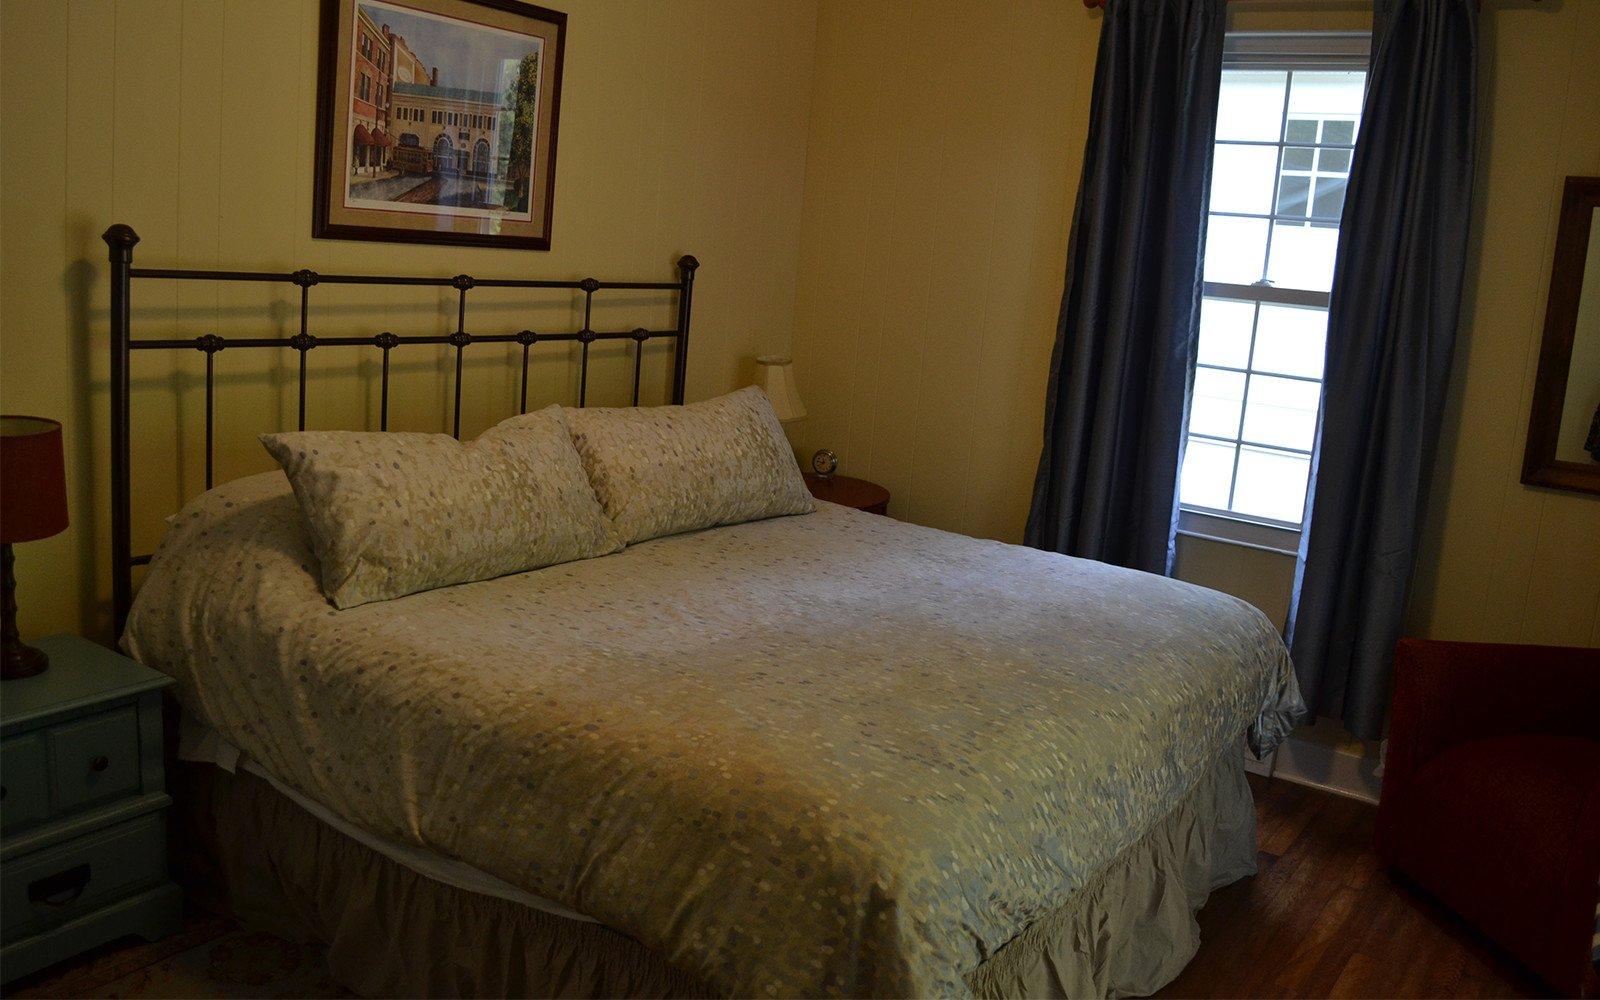 Franklin-Street-house-King-bedroom-2